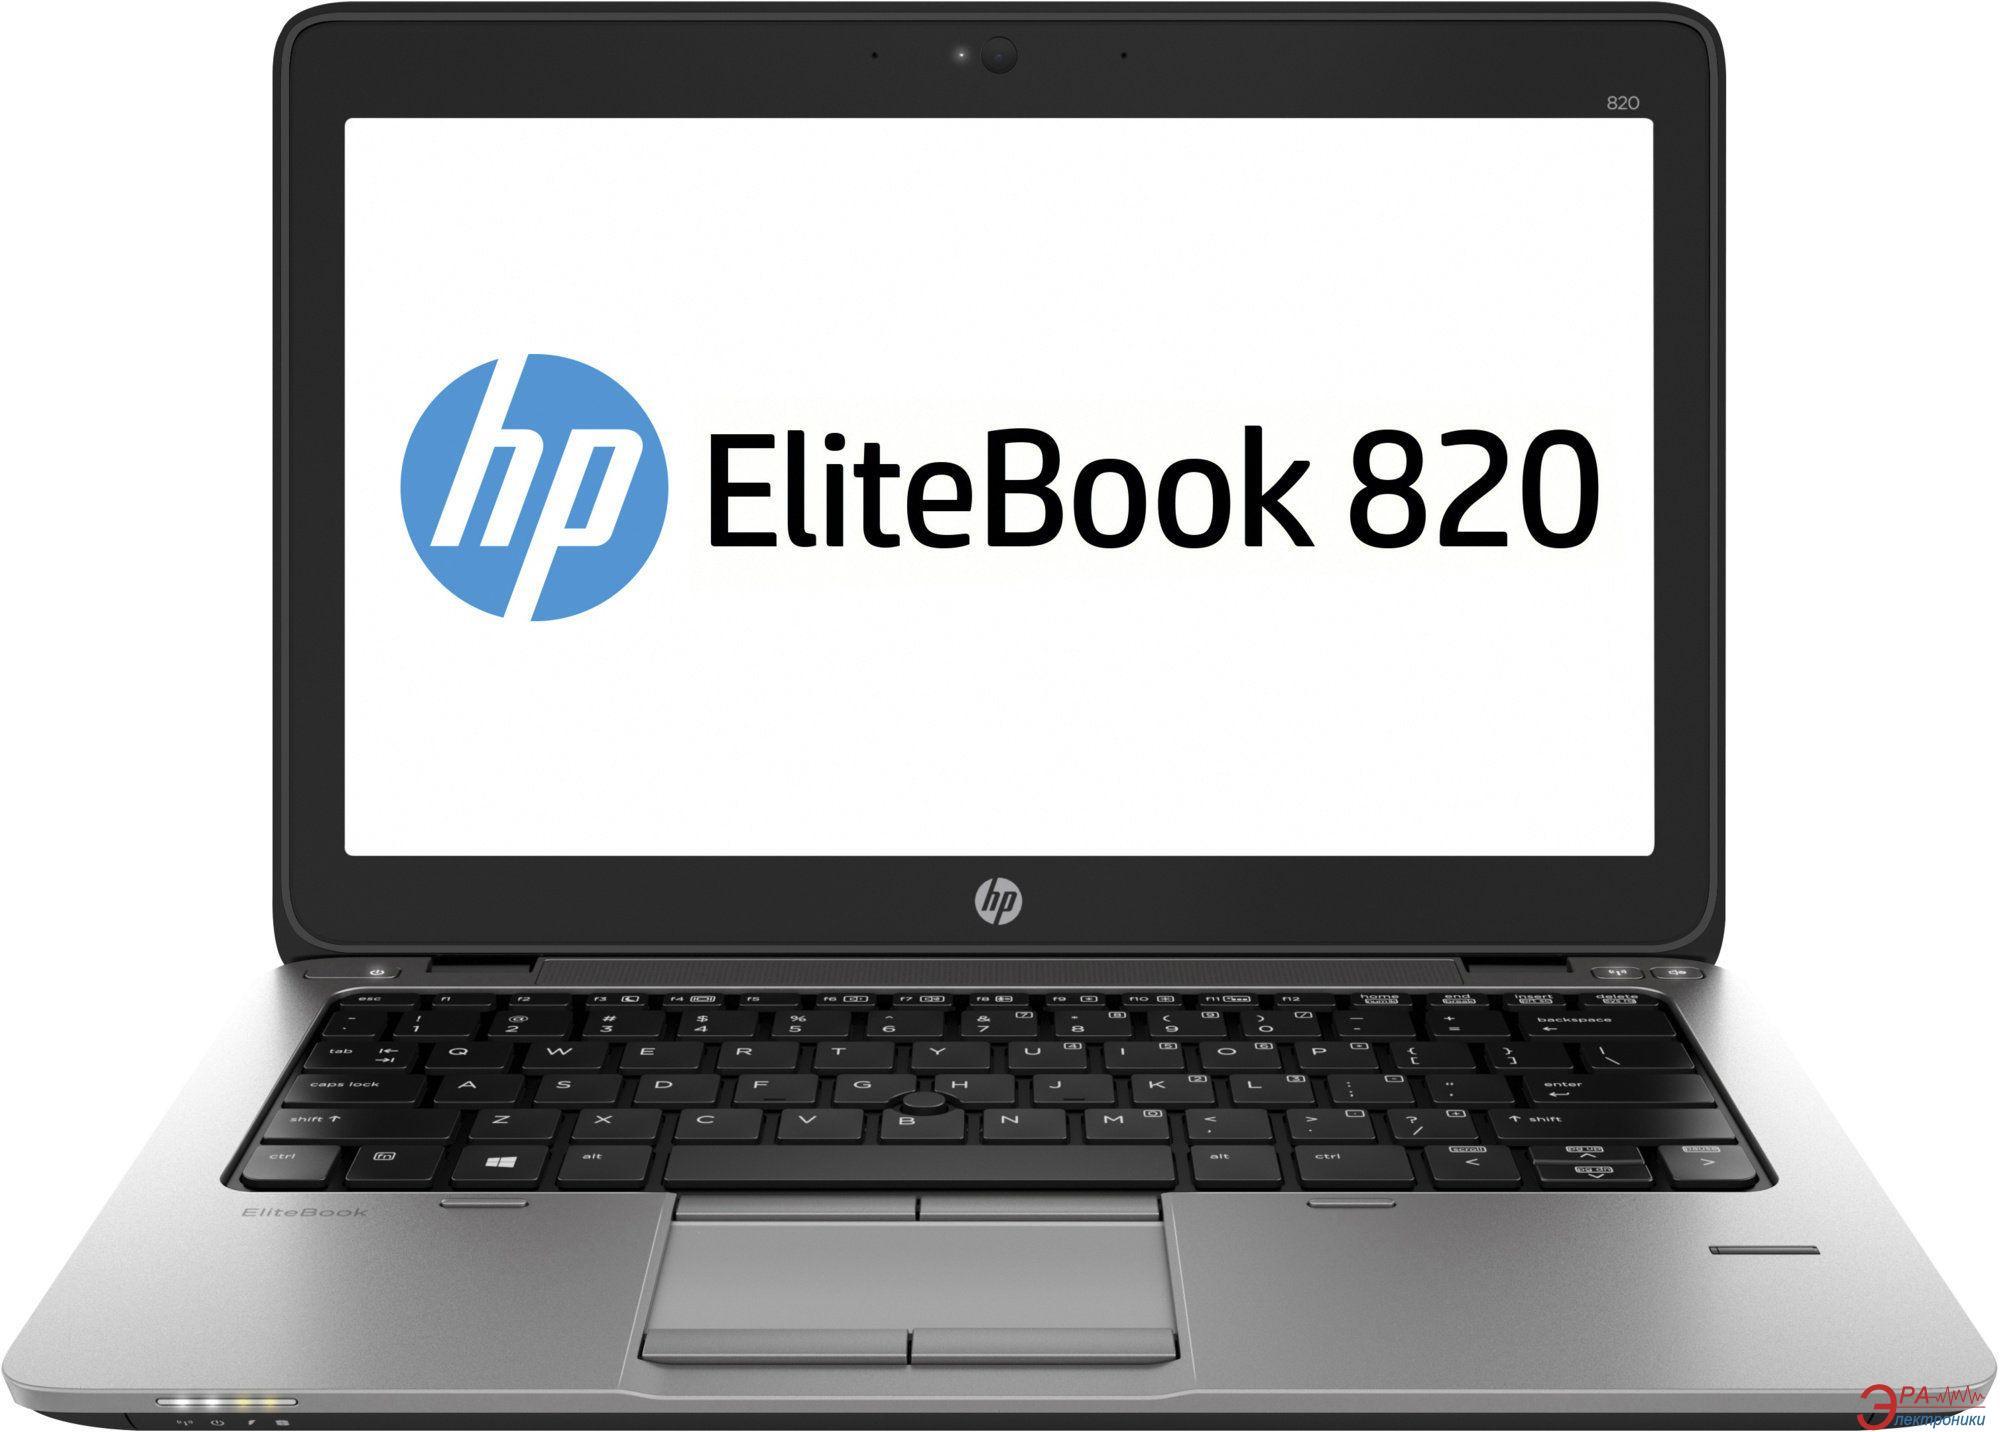 Ноутбук HP EliteBook 820 (F6N29AV) Silver